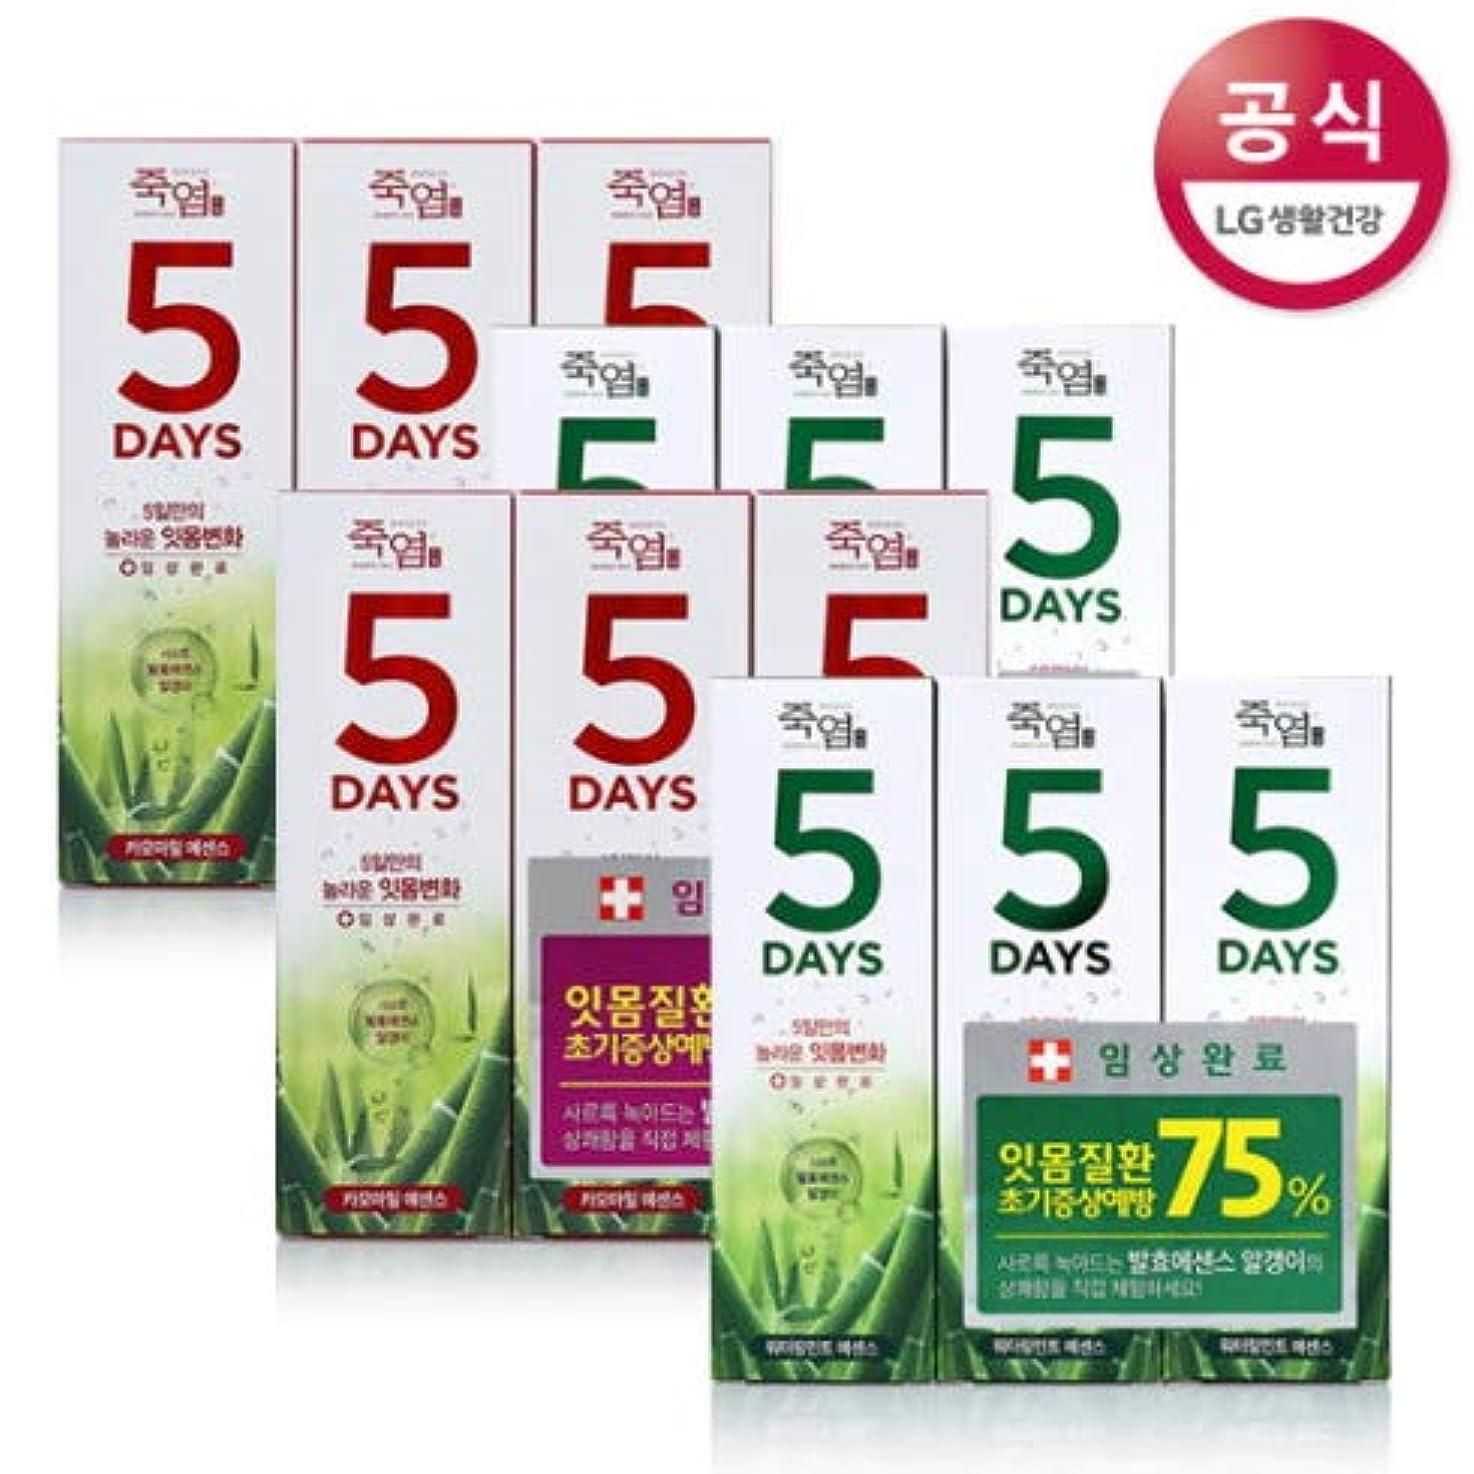 針相談大混乱[LG HnB] Bamboo Salt 5days Toothpaste /竹塩5days歯磨き粉 100gx12個(海外直送品)